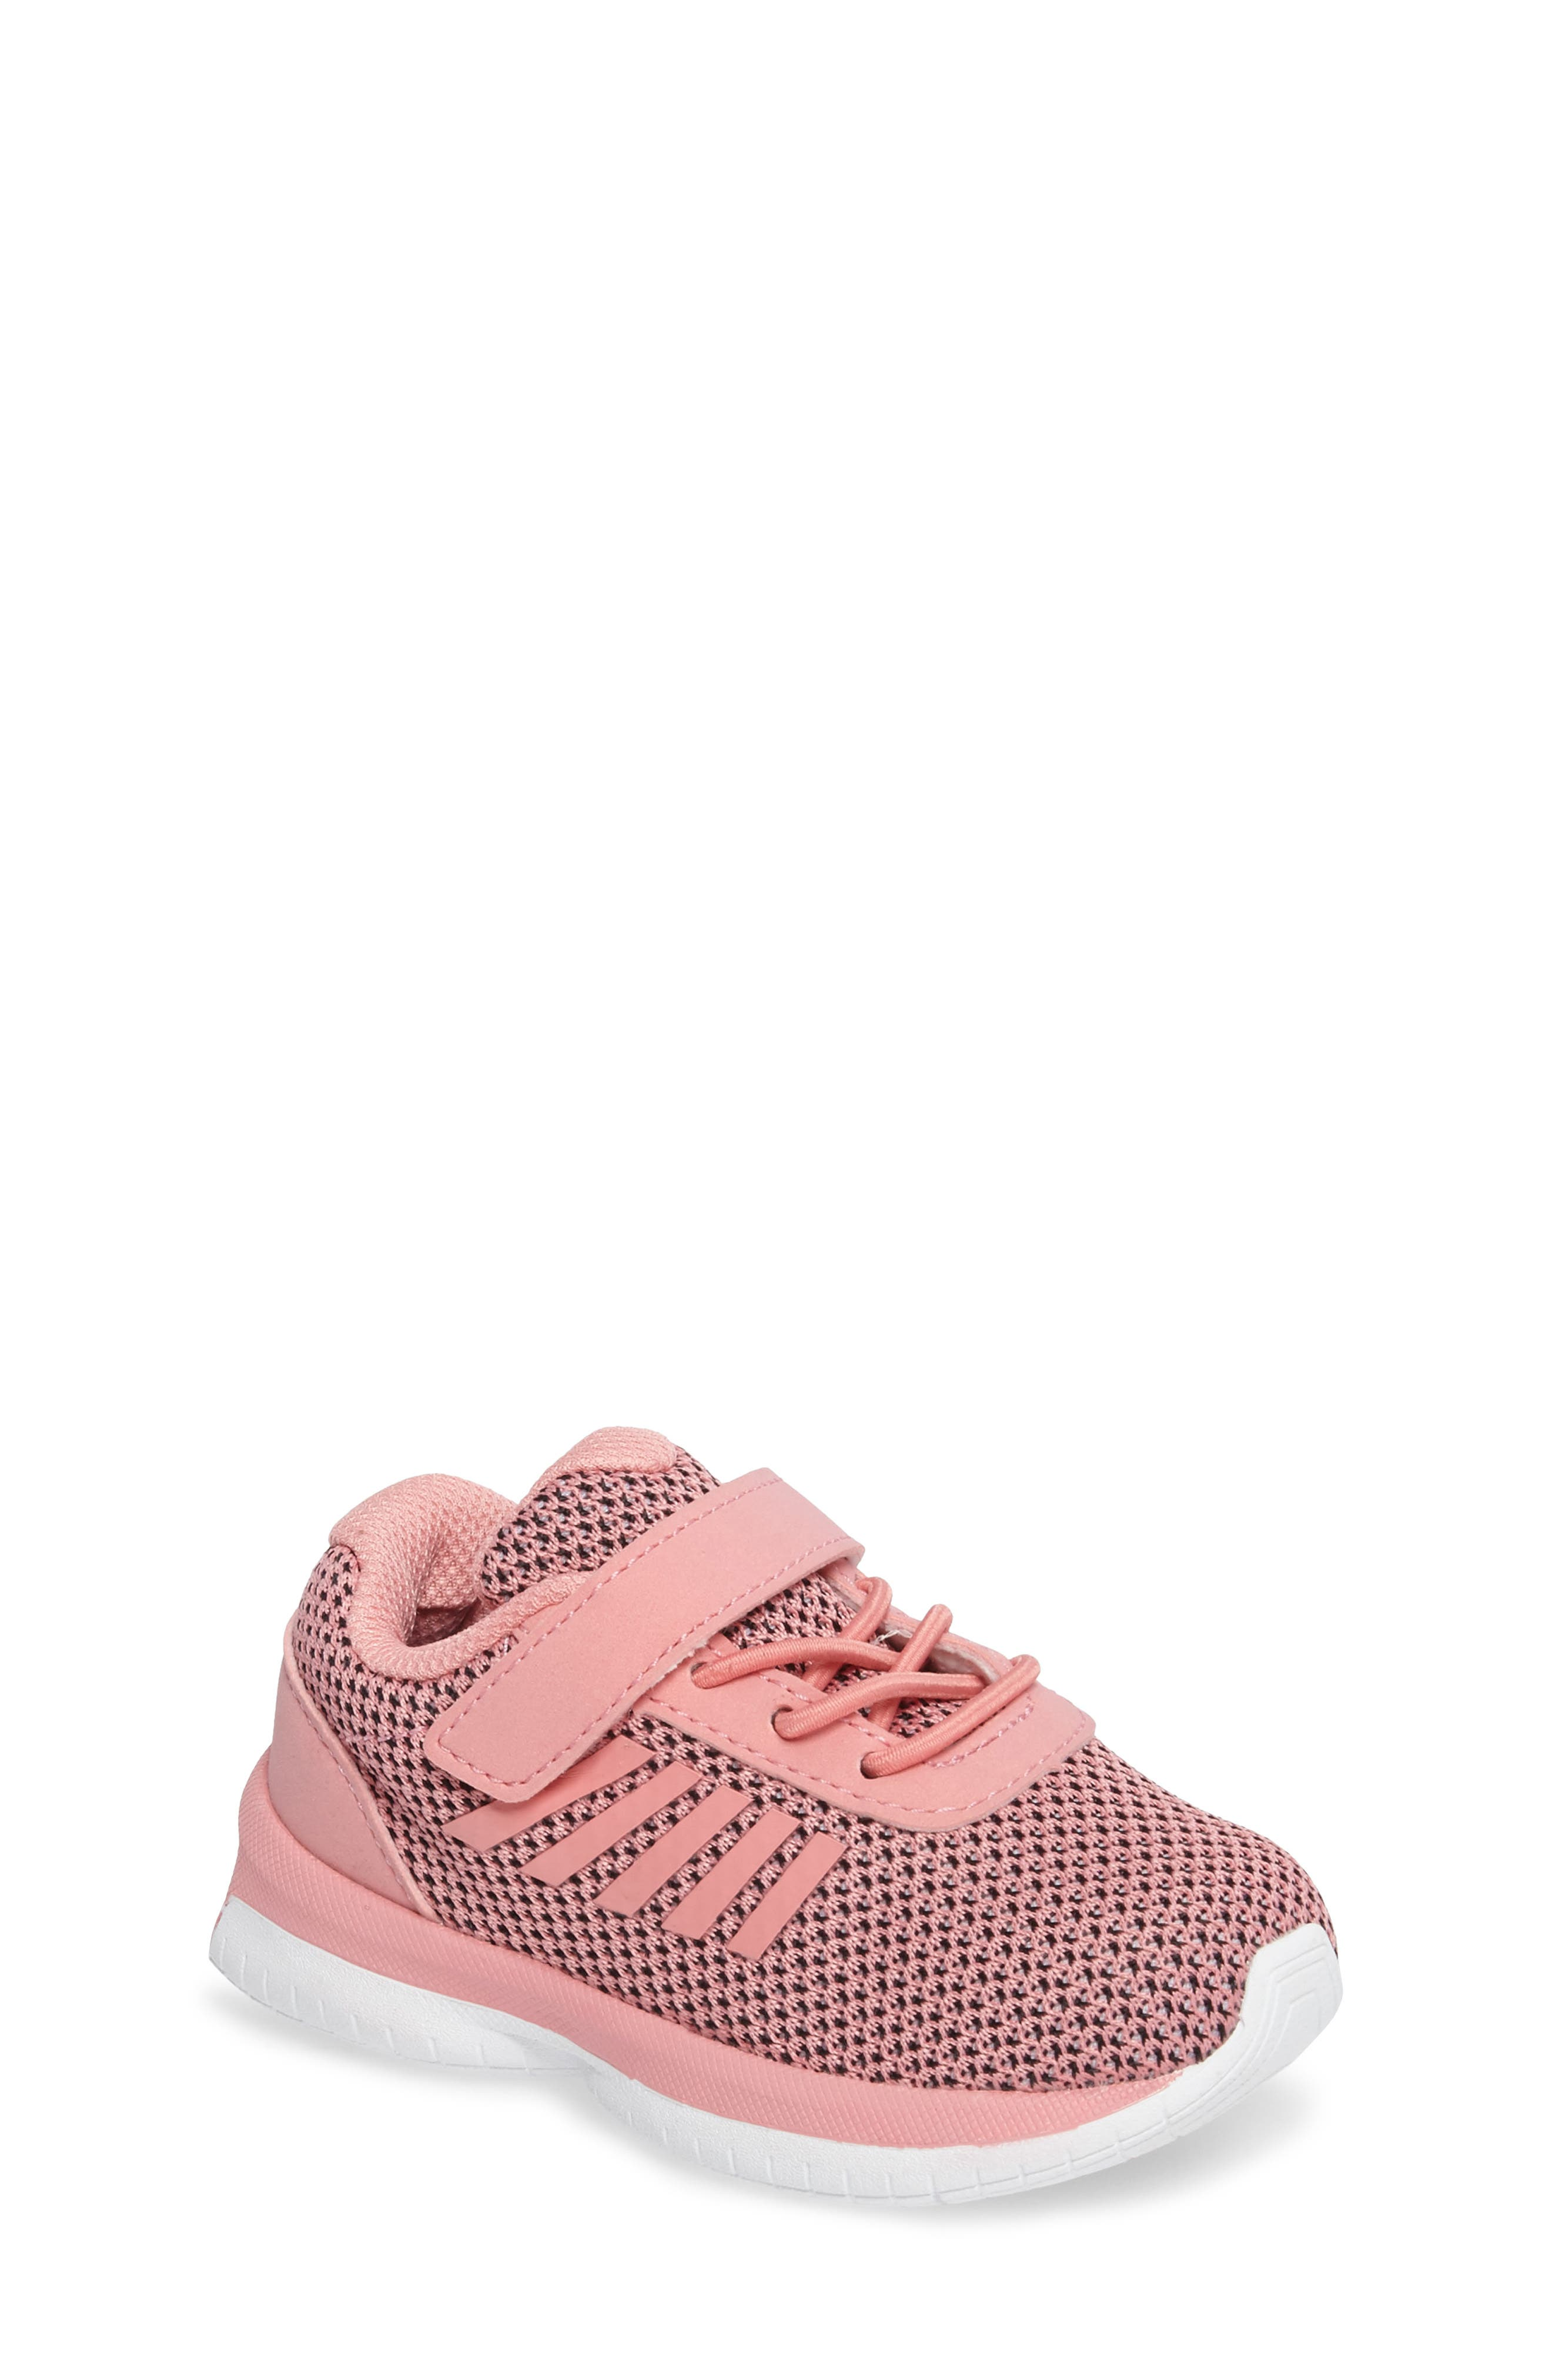 Tubes Infinity Sneaker,                         Main,                         color, 650